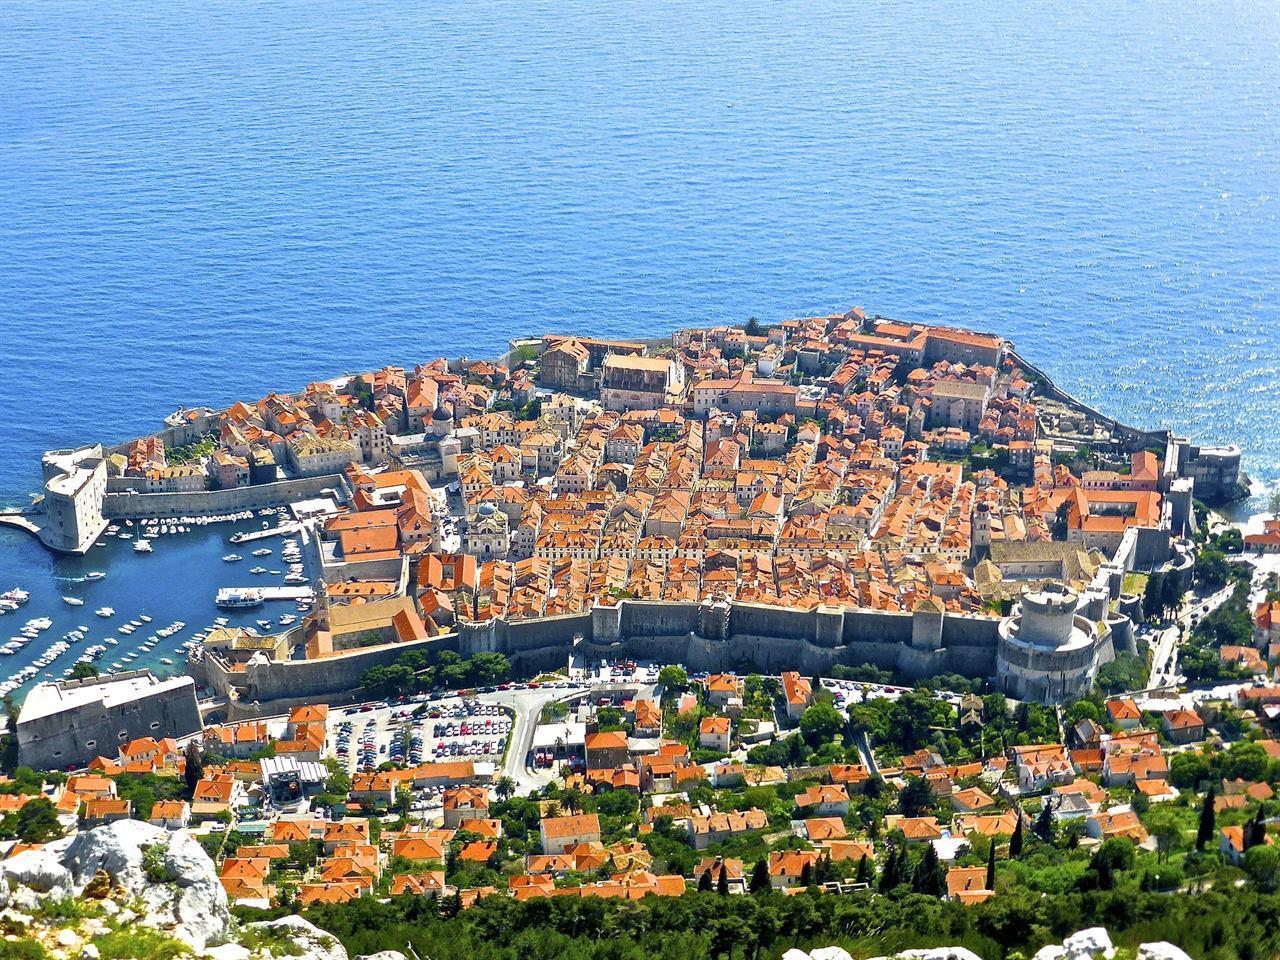 Берег Адриатического моря в Хорватии